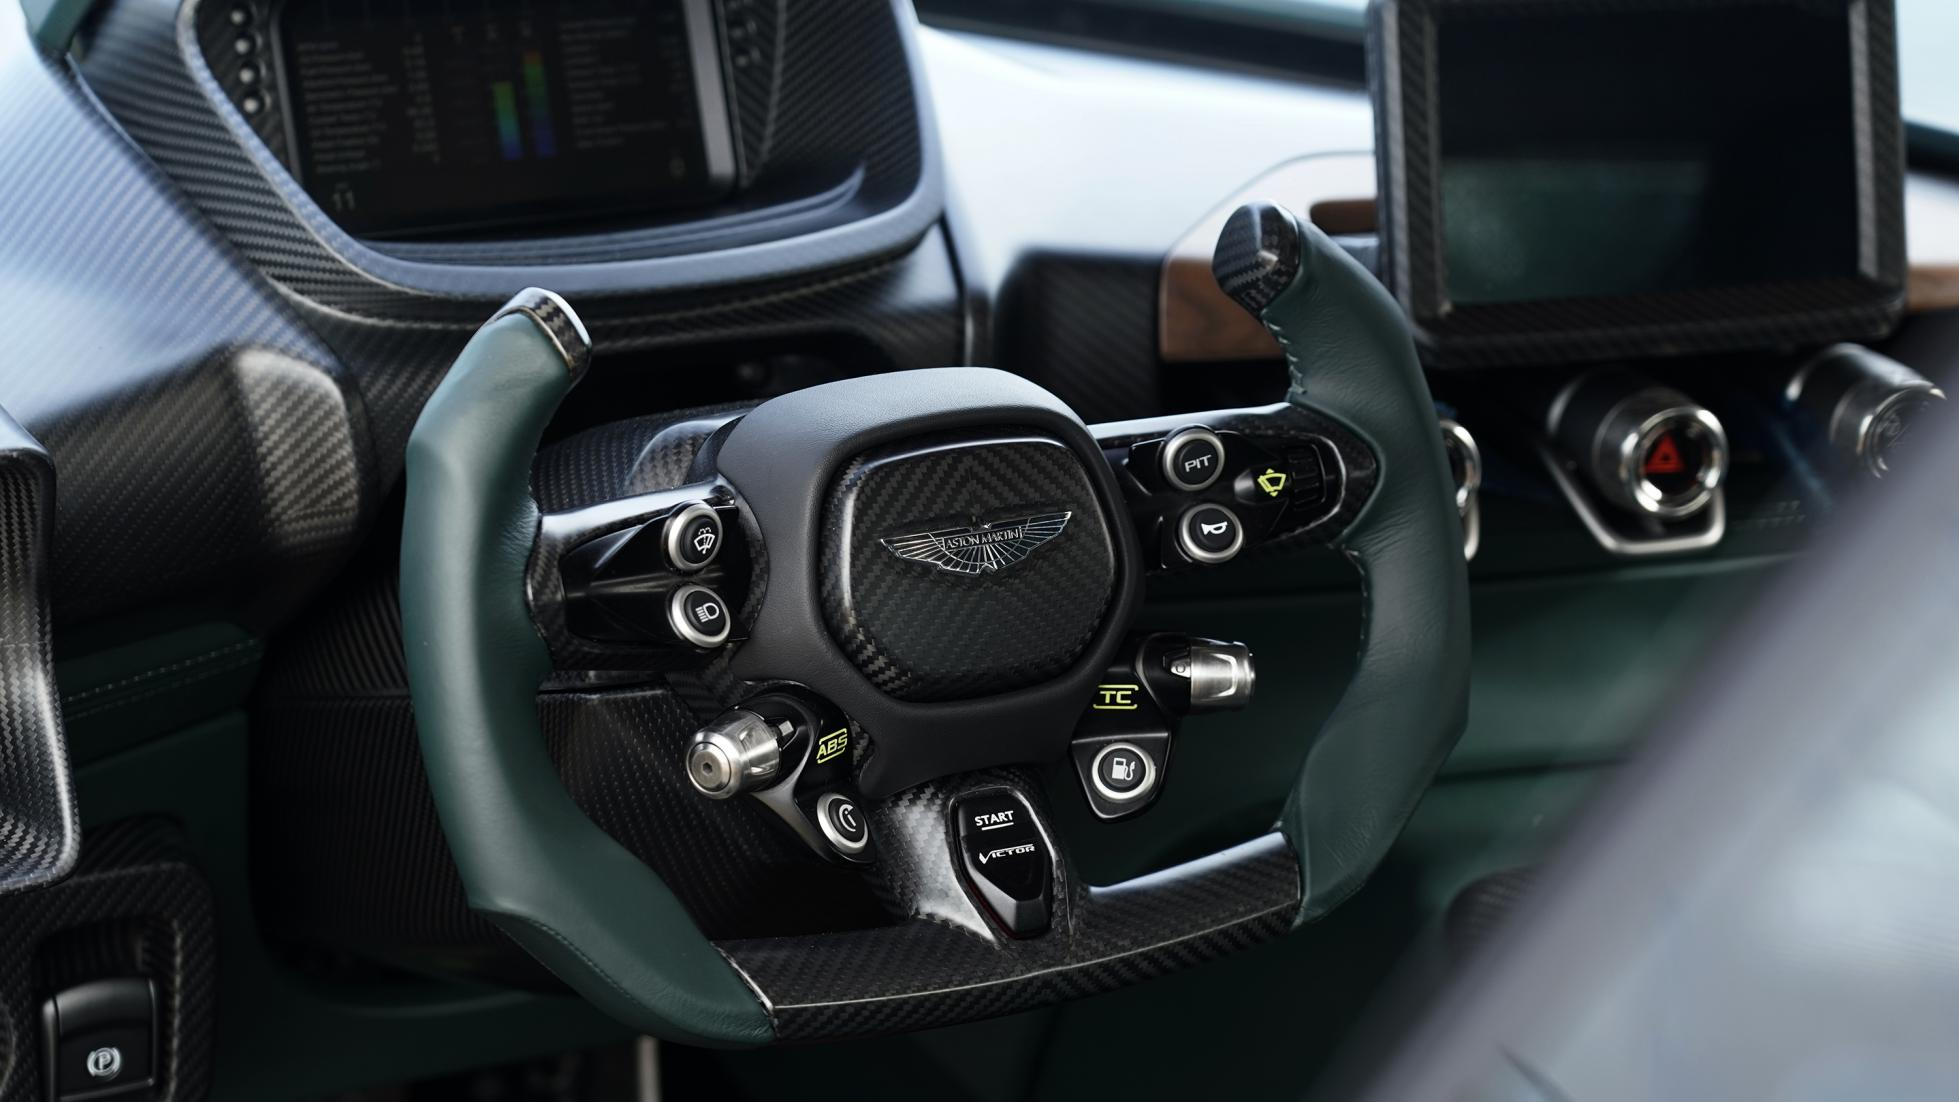 Topgear The Aston Martin Victor Is An 836bhp Manual Masterpiece